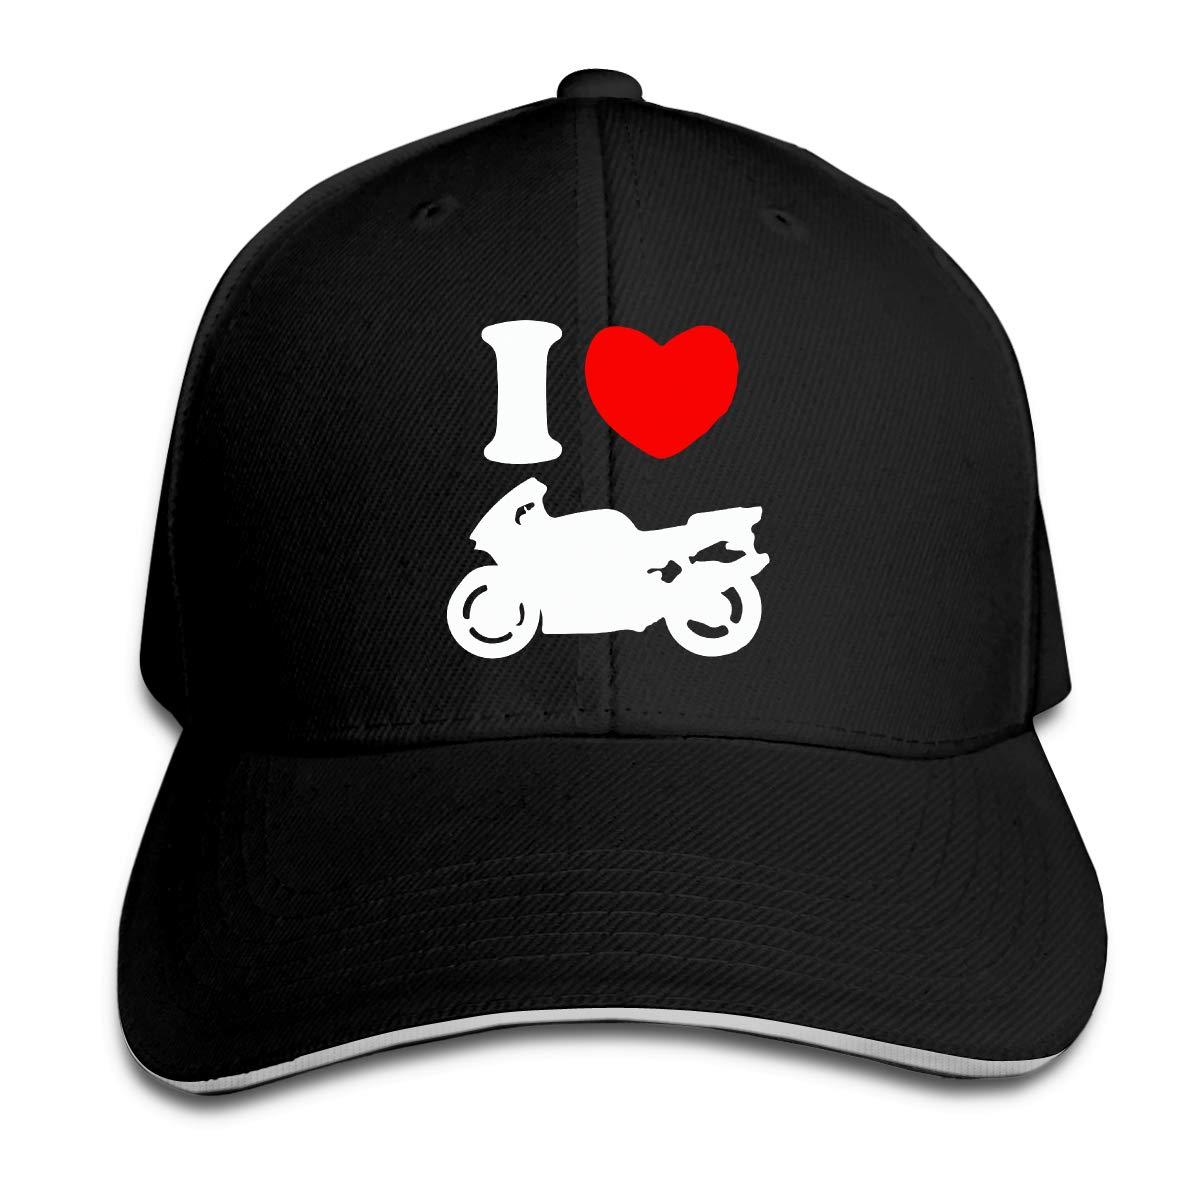 I Heart Love Sport Bike Outdoor Snapback Sandwich Cap Adjustable Baseball Hat Hip Hop Hat